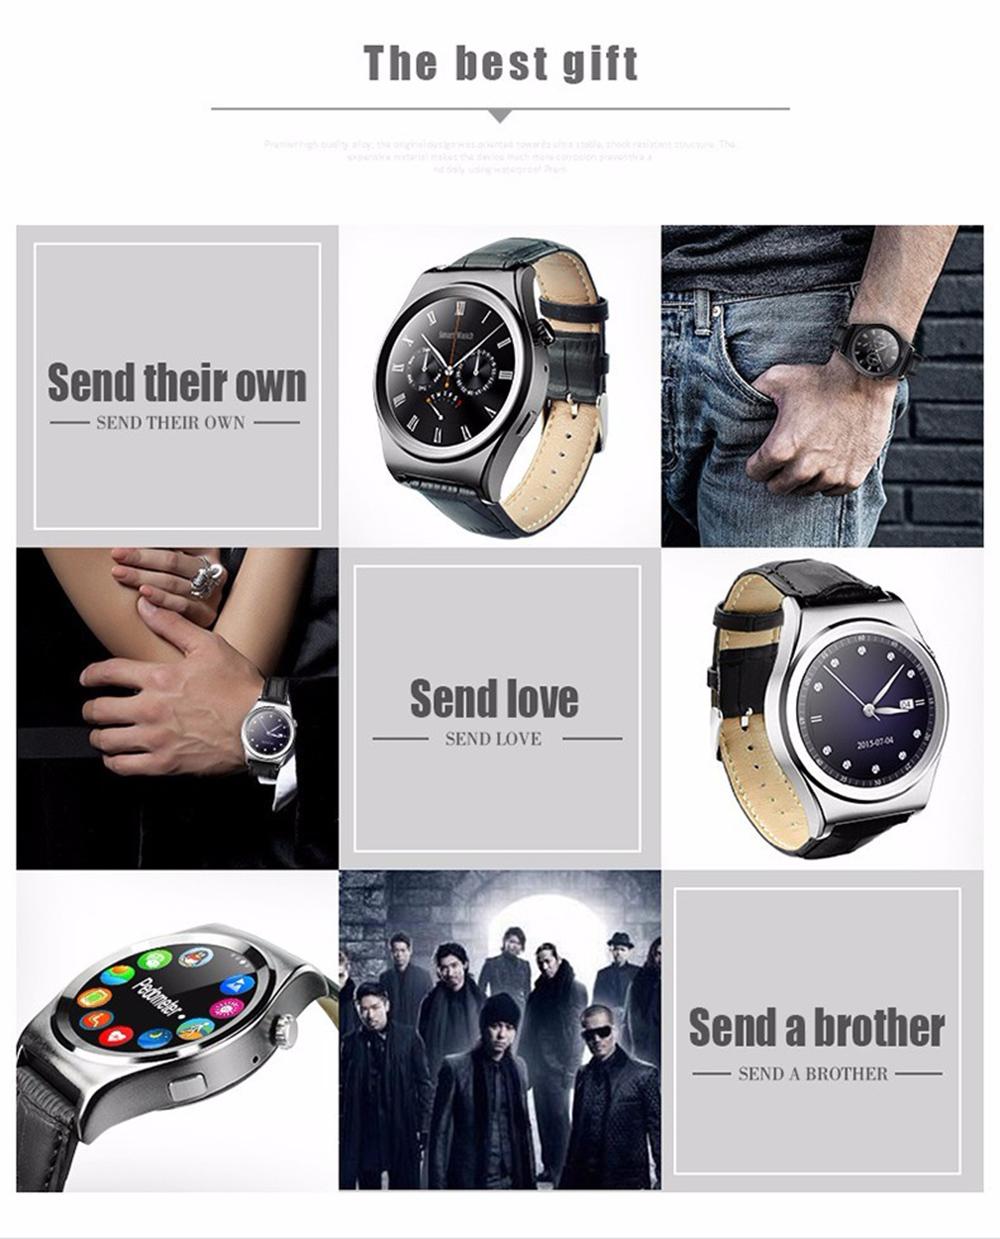 ALANTURING Bluetooth fashion Smart Watch SW15 fitness active tracker sleep hear rate monitor anti lost smart bracelet band